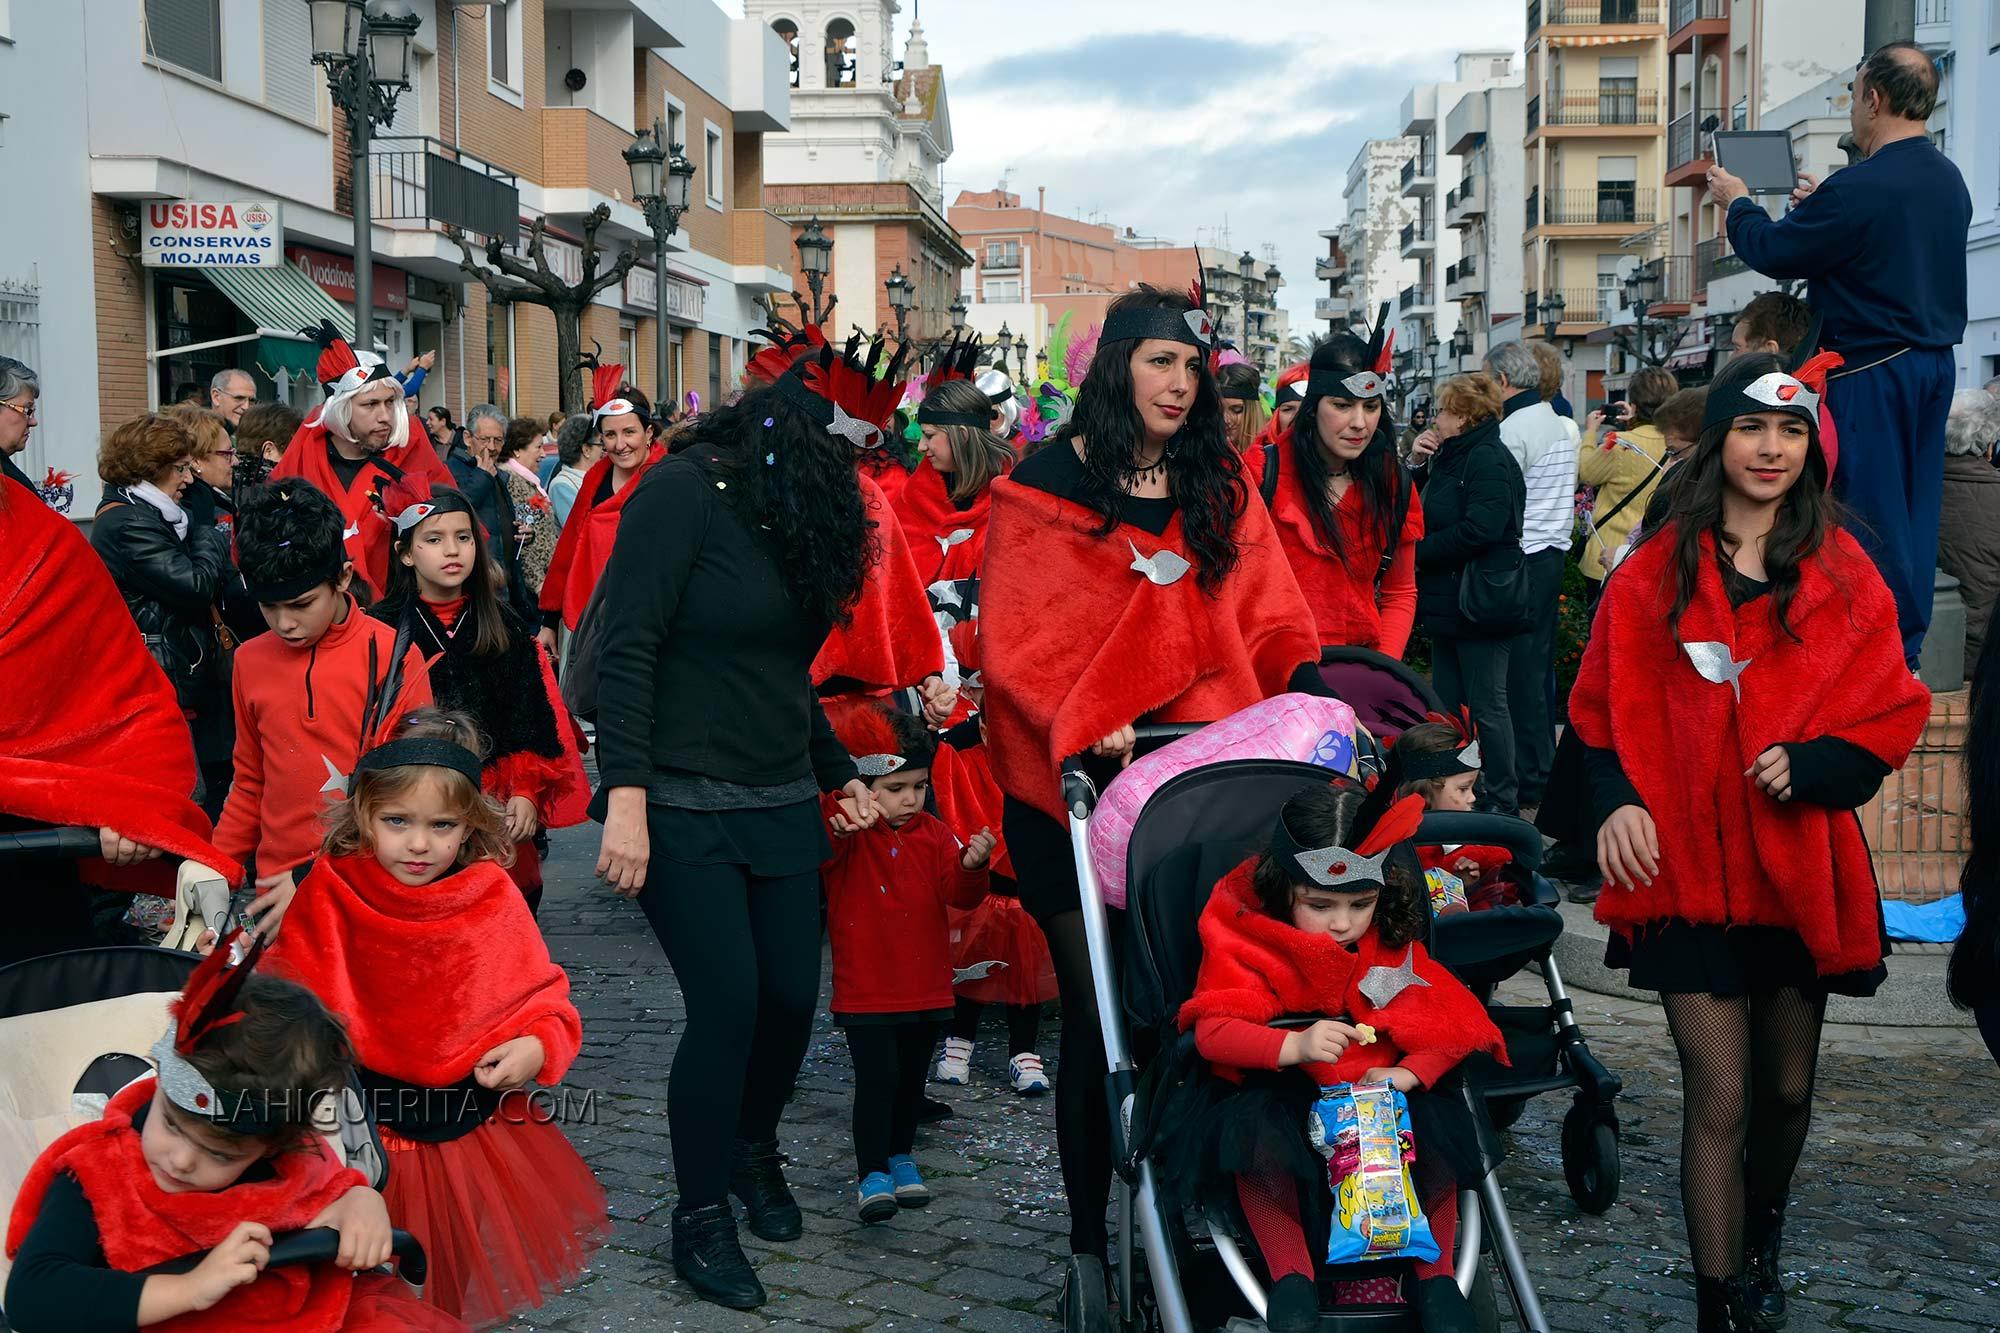 Cabalgata infantil de viudas carnaval de Isla cristina 2016 _DSC1898